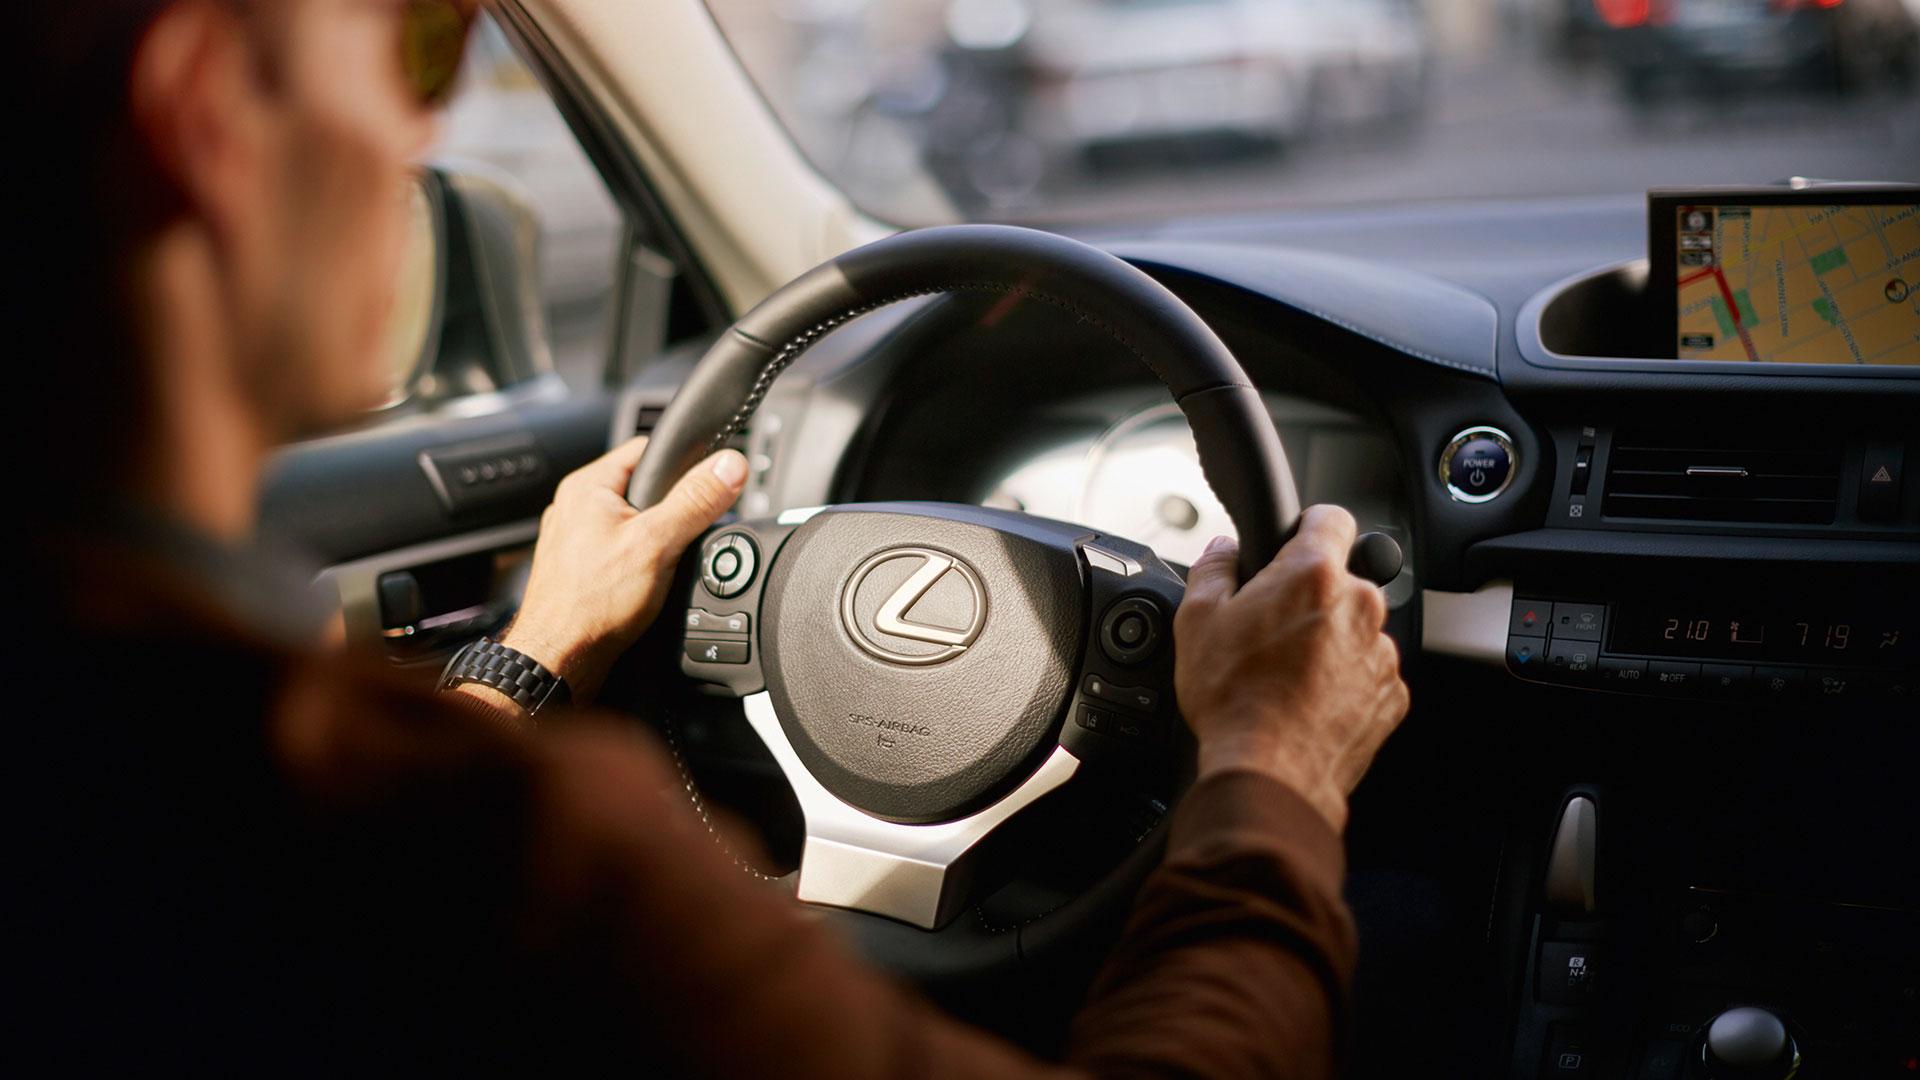 2018 lexus ct 200h my18 next steps behind the wheel